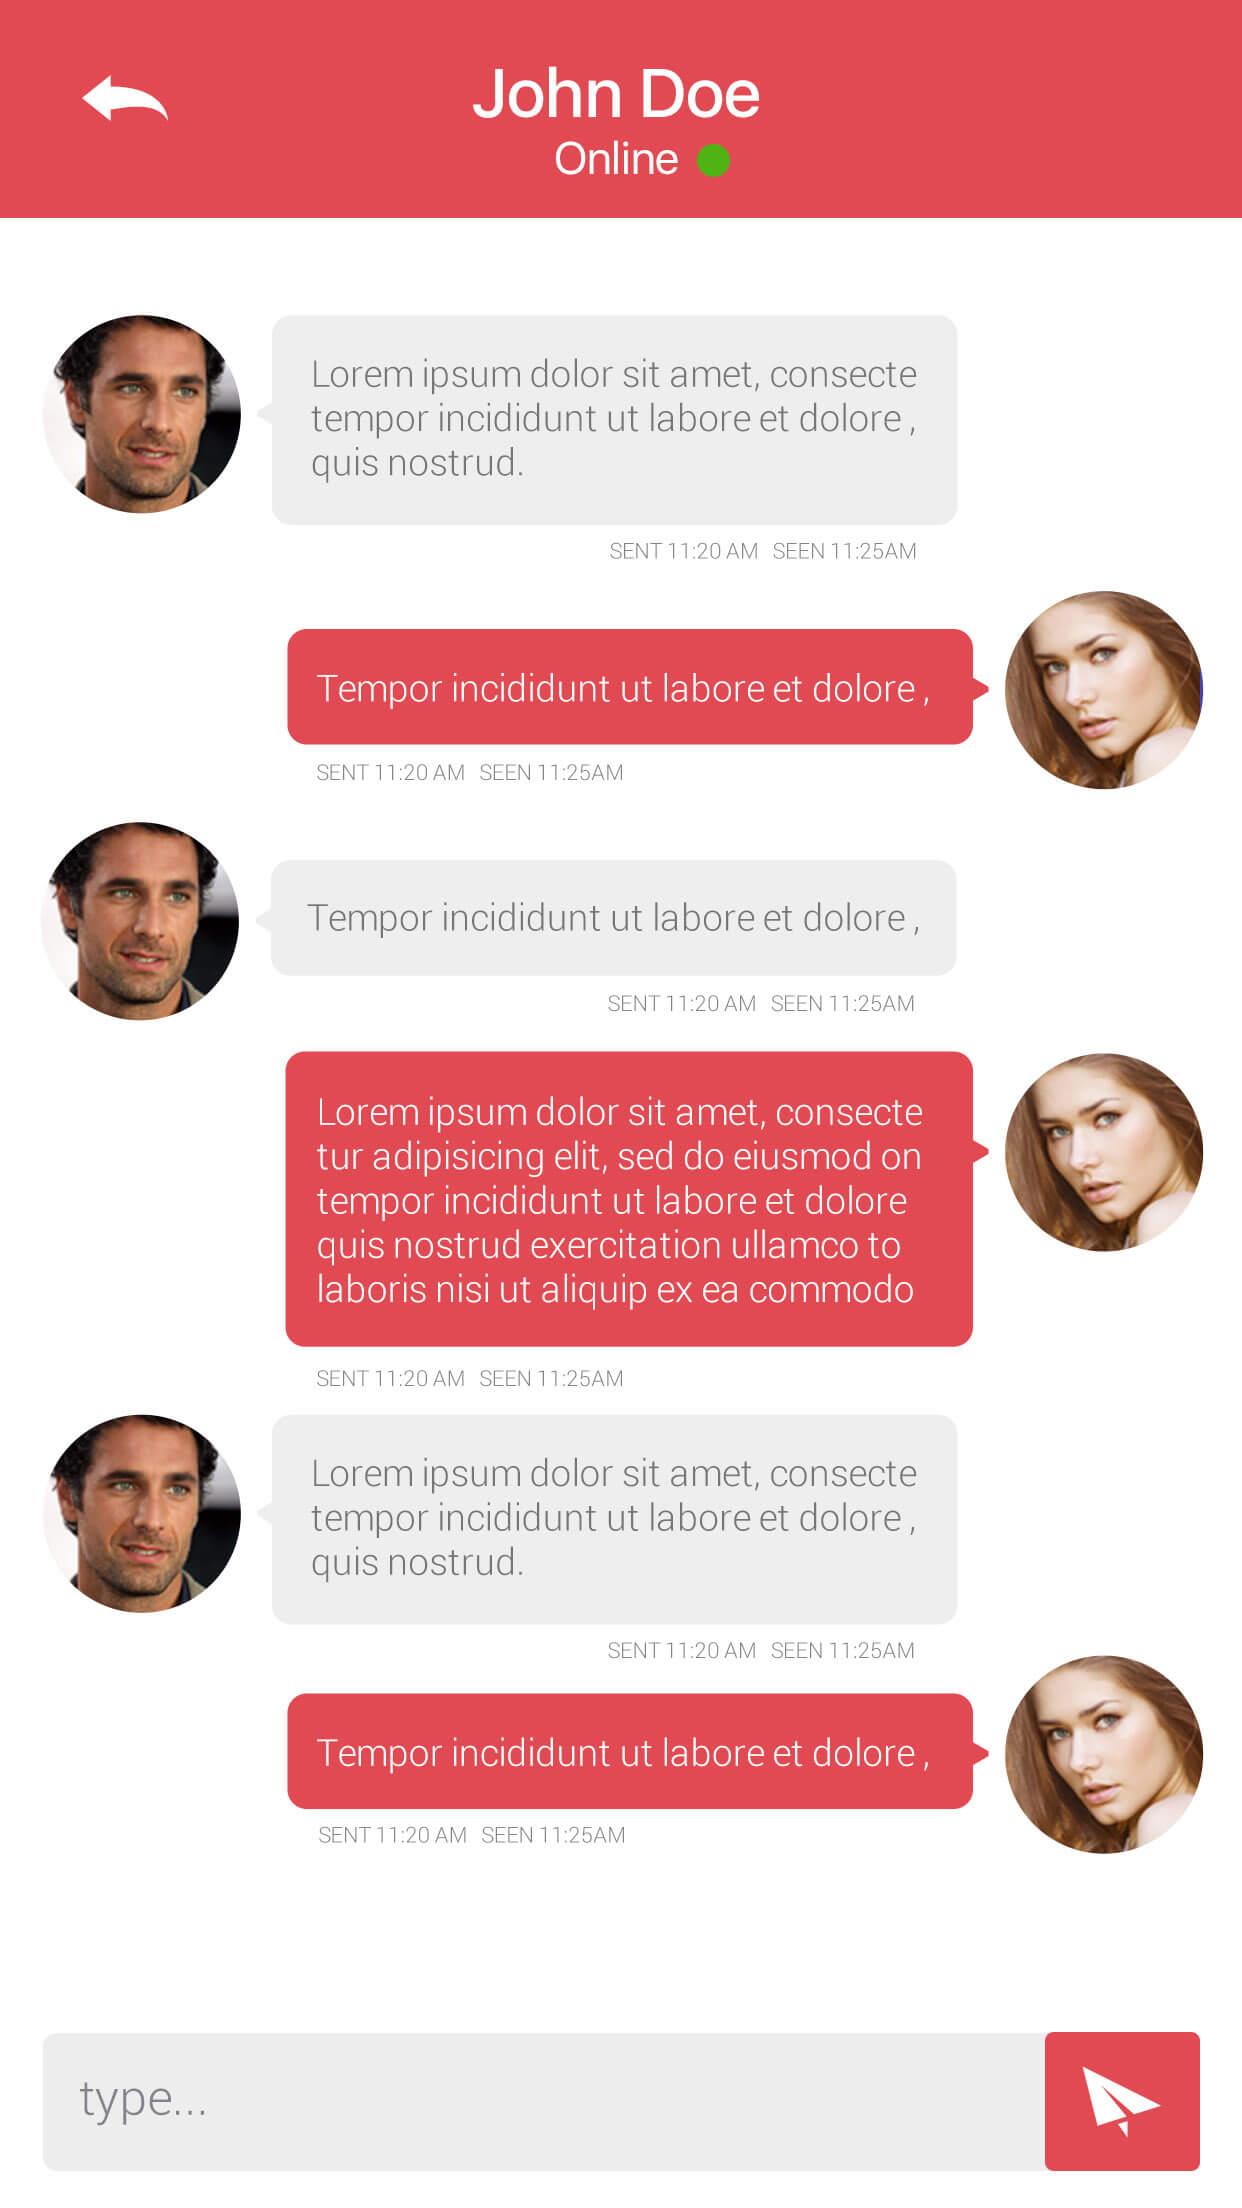 Chat Details